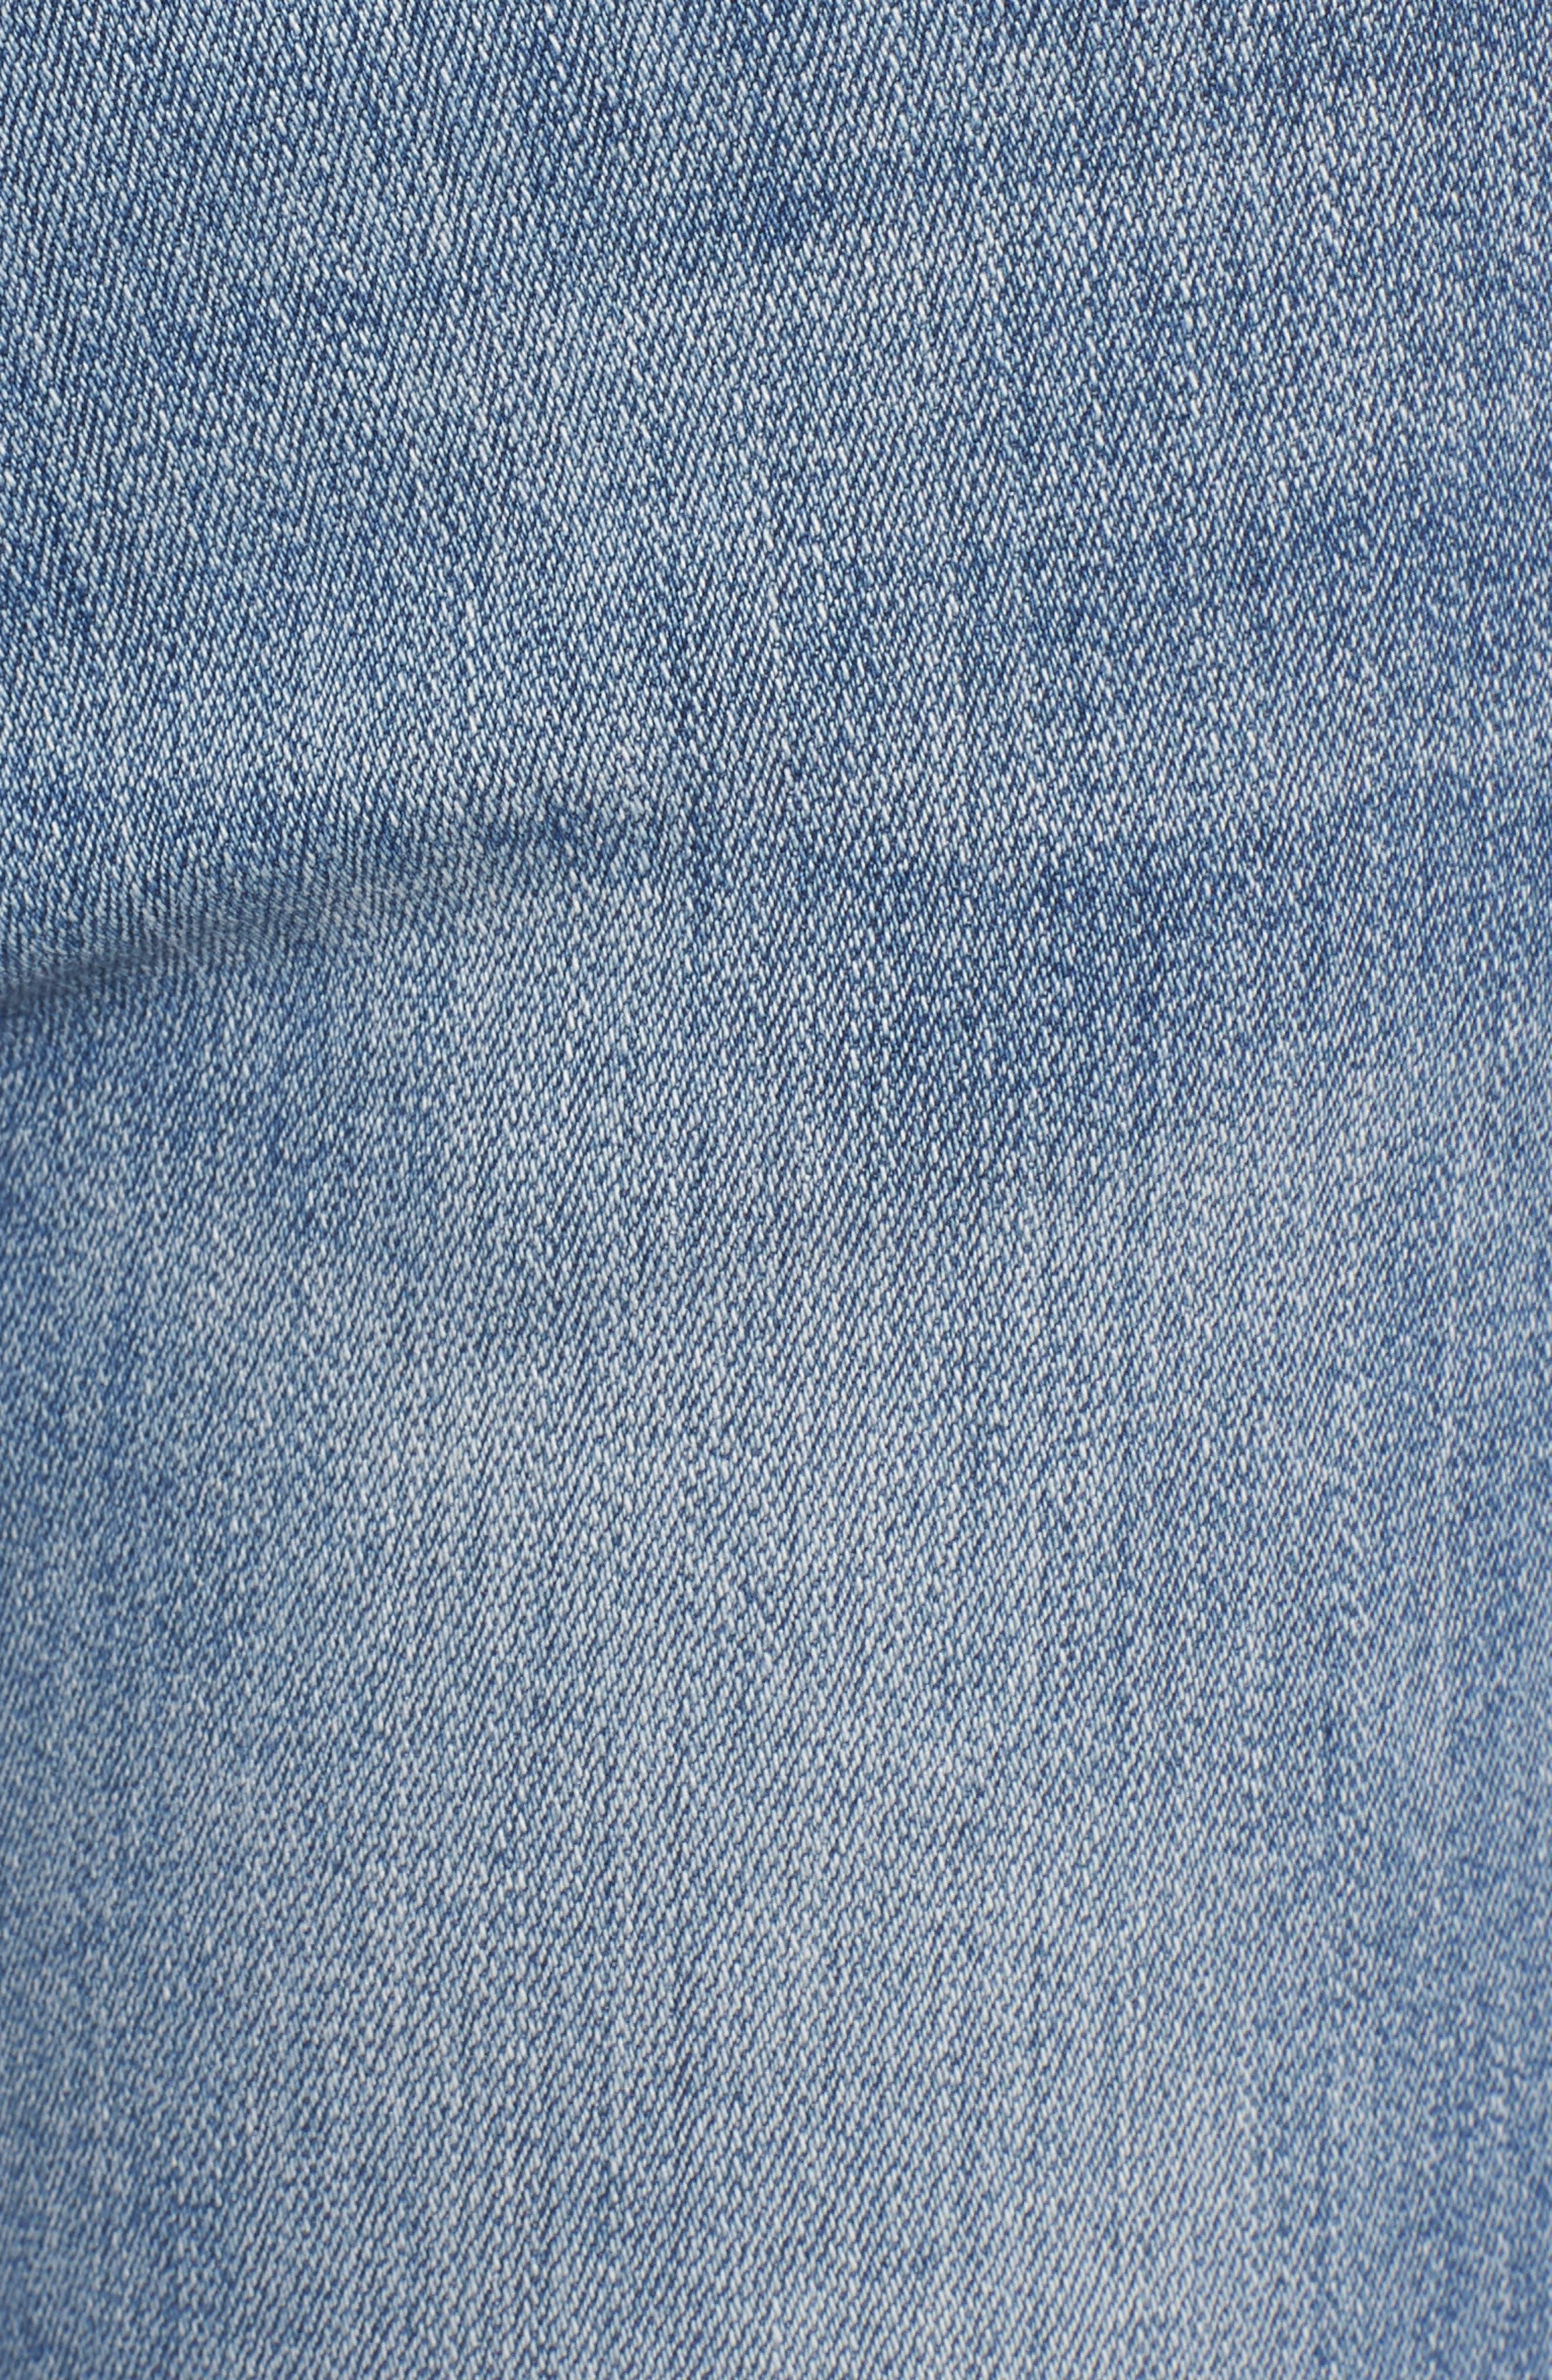 Farrow Instaslim High Waist Ankle Skinny Jeans,                             Alternate thumbnail 6, color,                             429